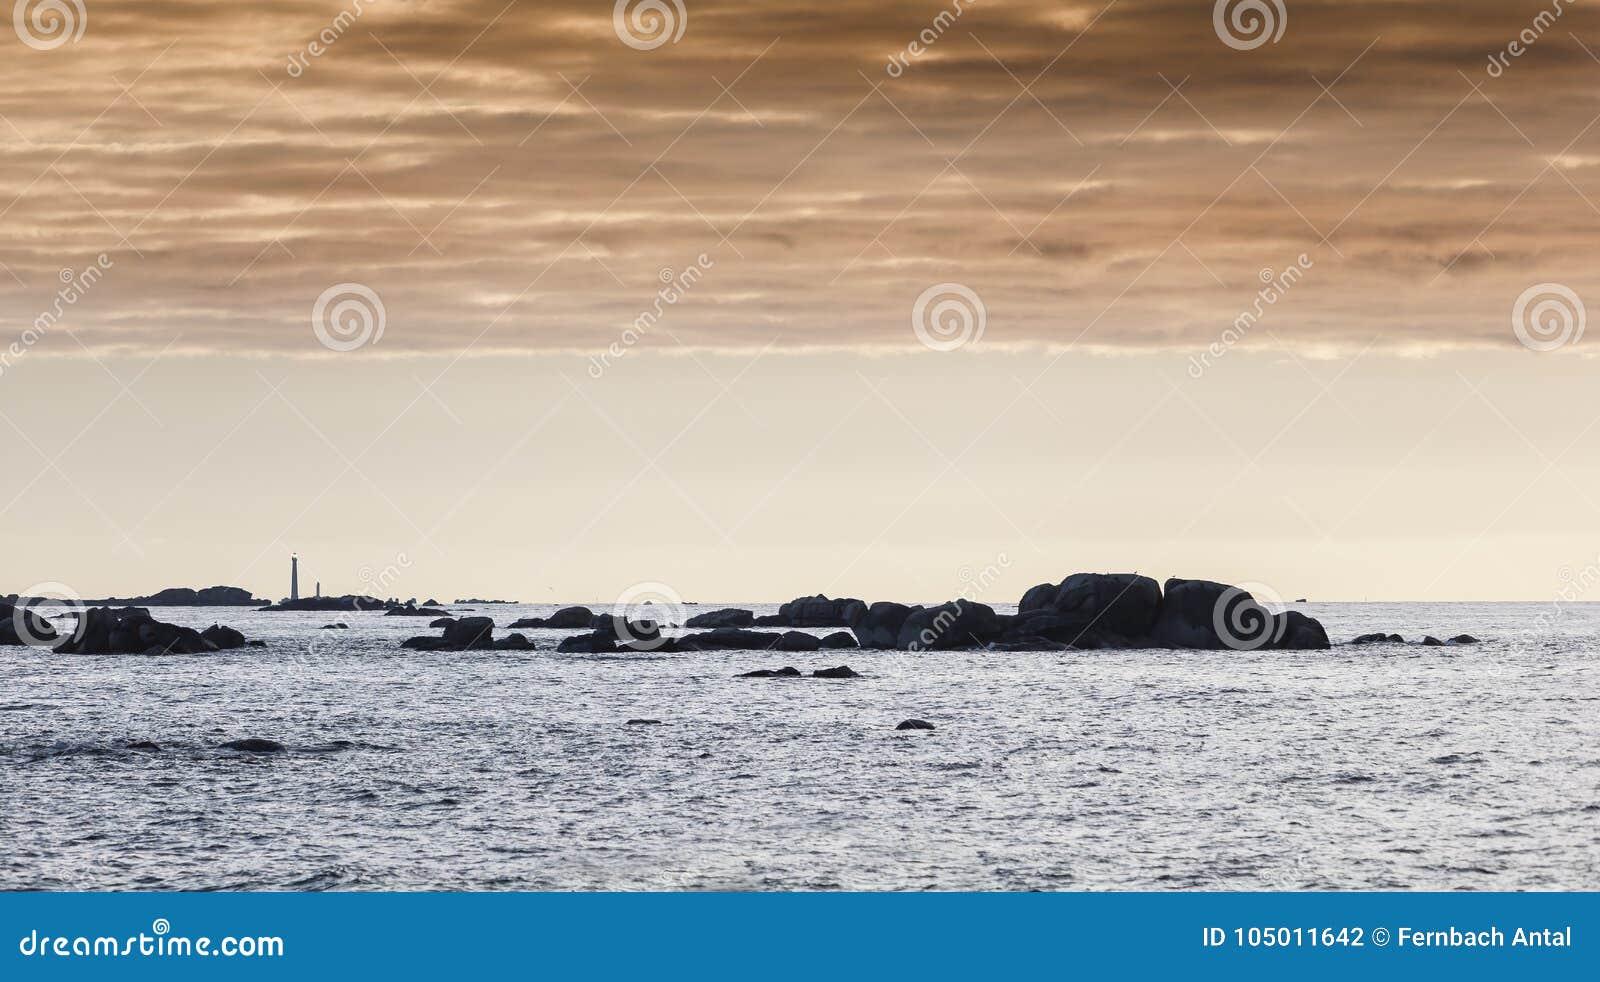 Damatic tänder kustlinjen i Brittany, Frankrike i solnedgång med en li